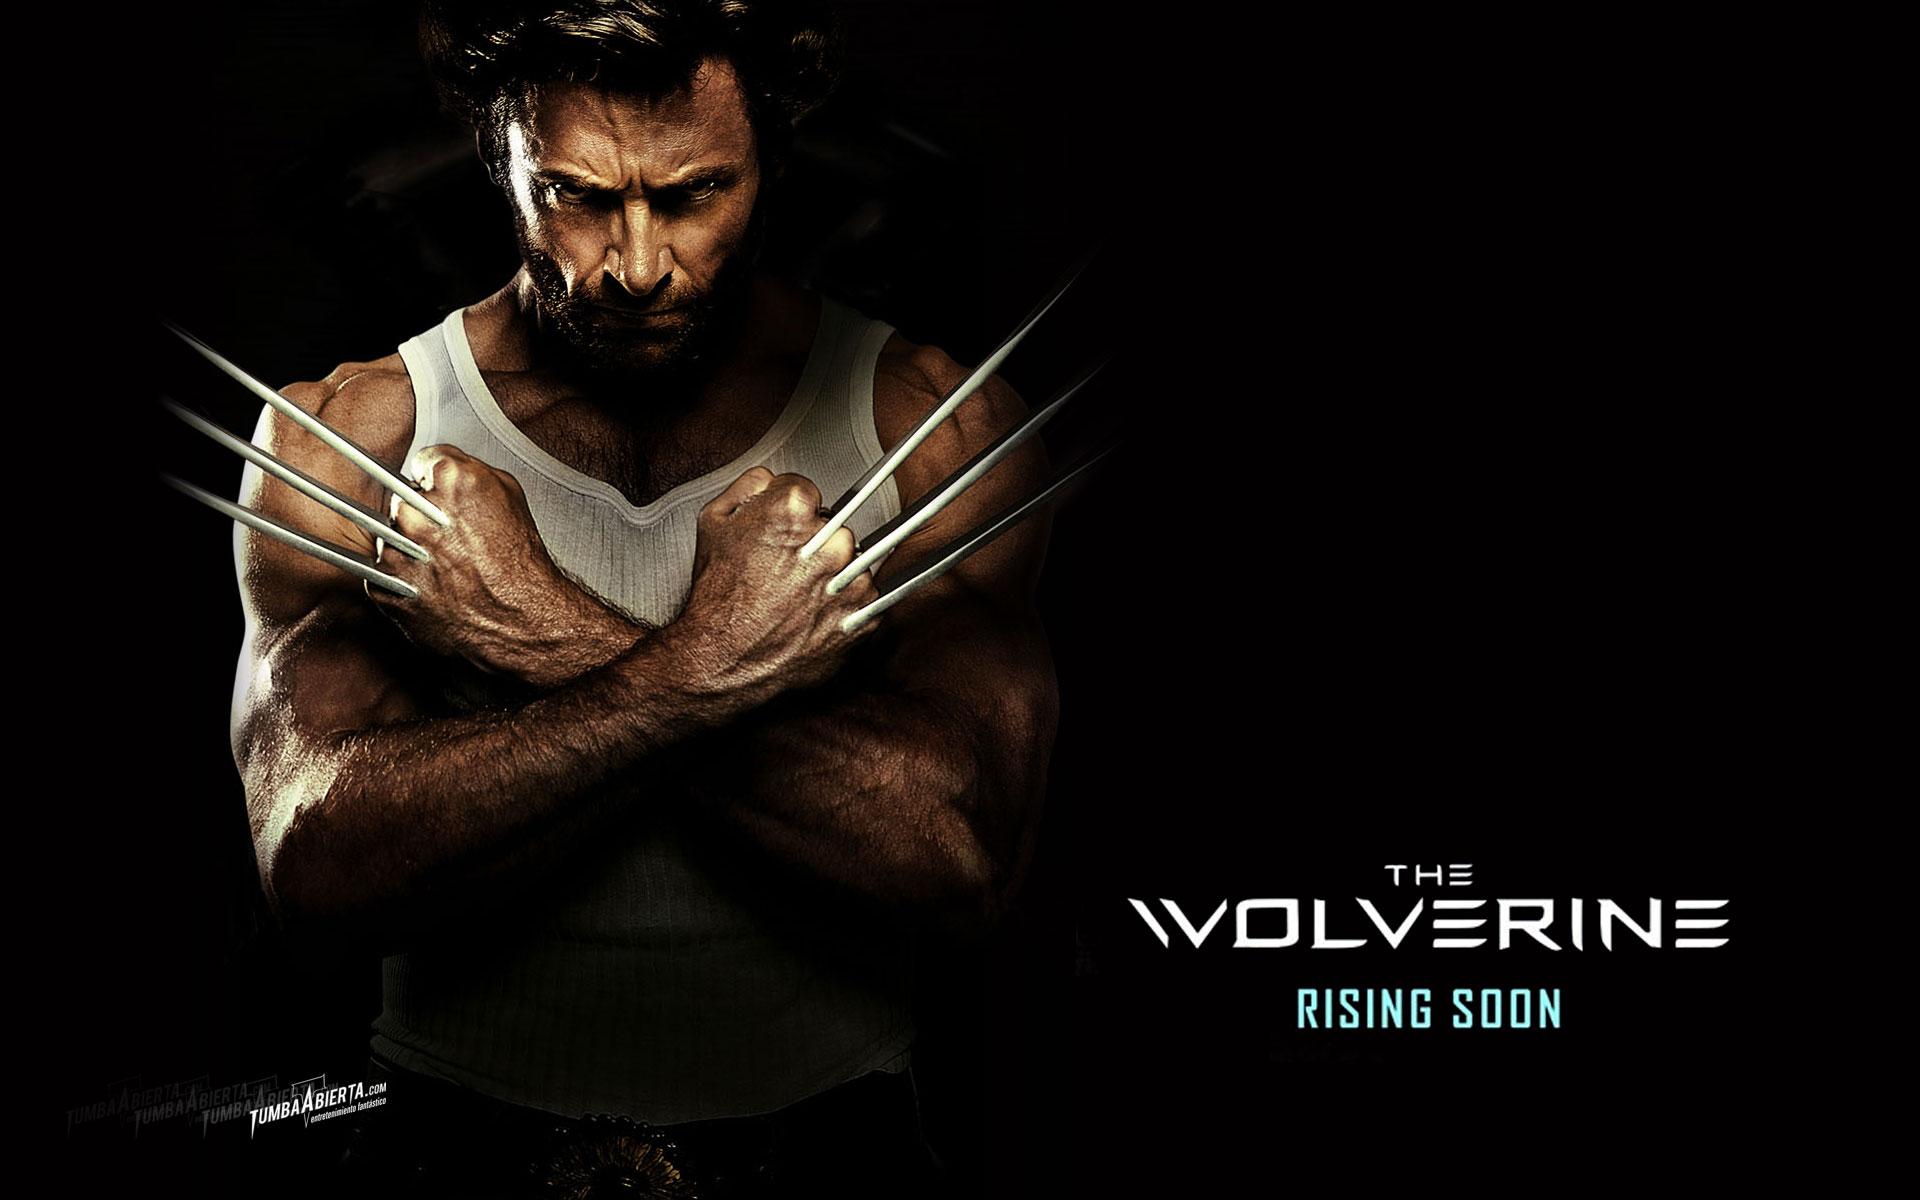 Wallpaper. The Wolverine. Lobezno Inmortal HD